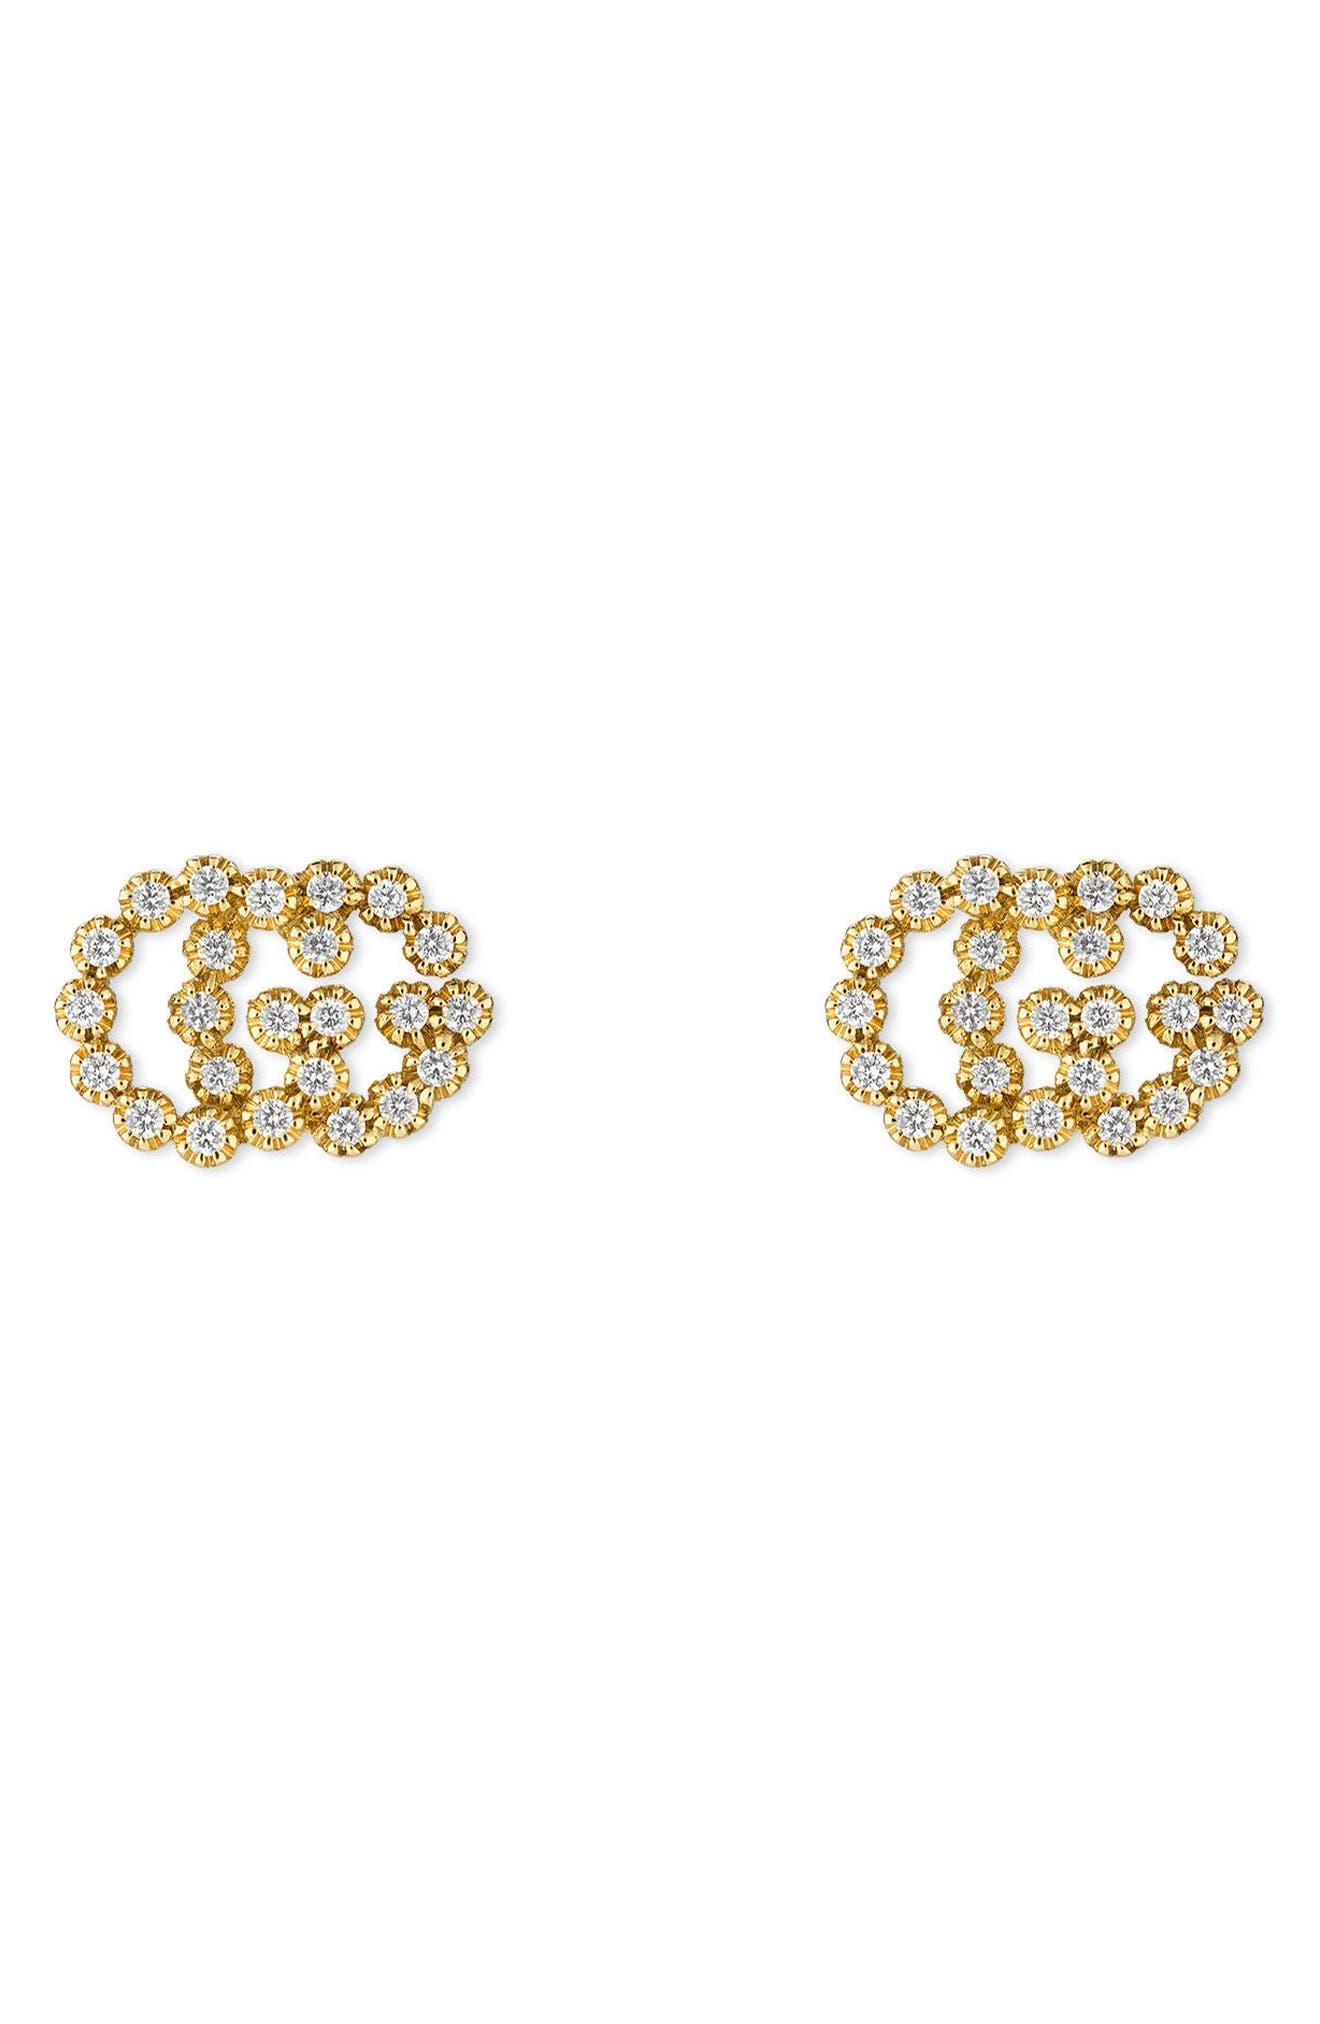 Double-G Diamond Stud Earrings,                         Main,                         color, YELLOW GOLD